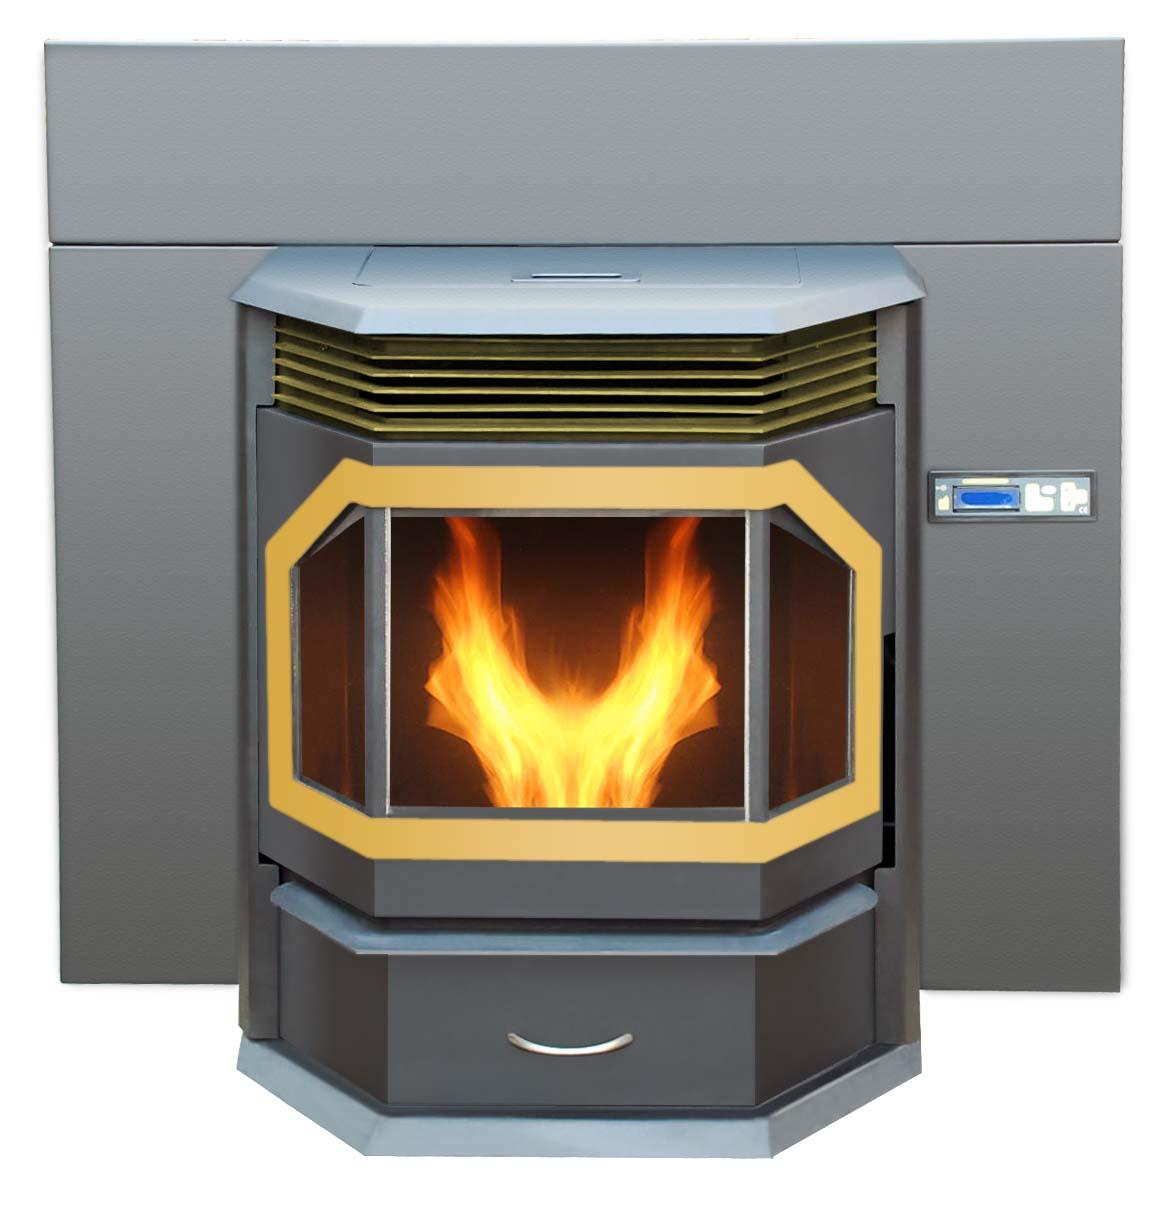 pinnacle multi fuel corn stove. Black Bedroom Furniture Sets. Home Design Ideas